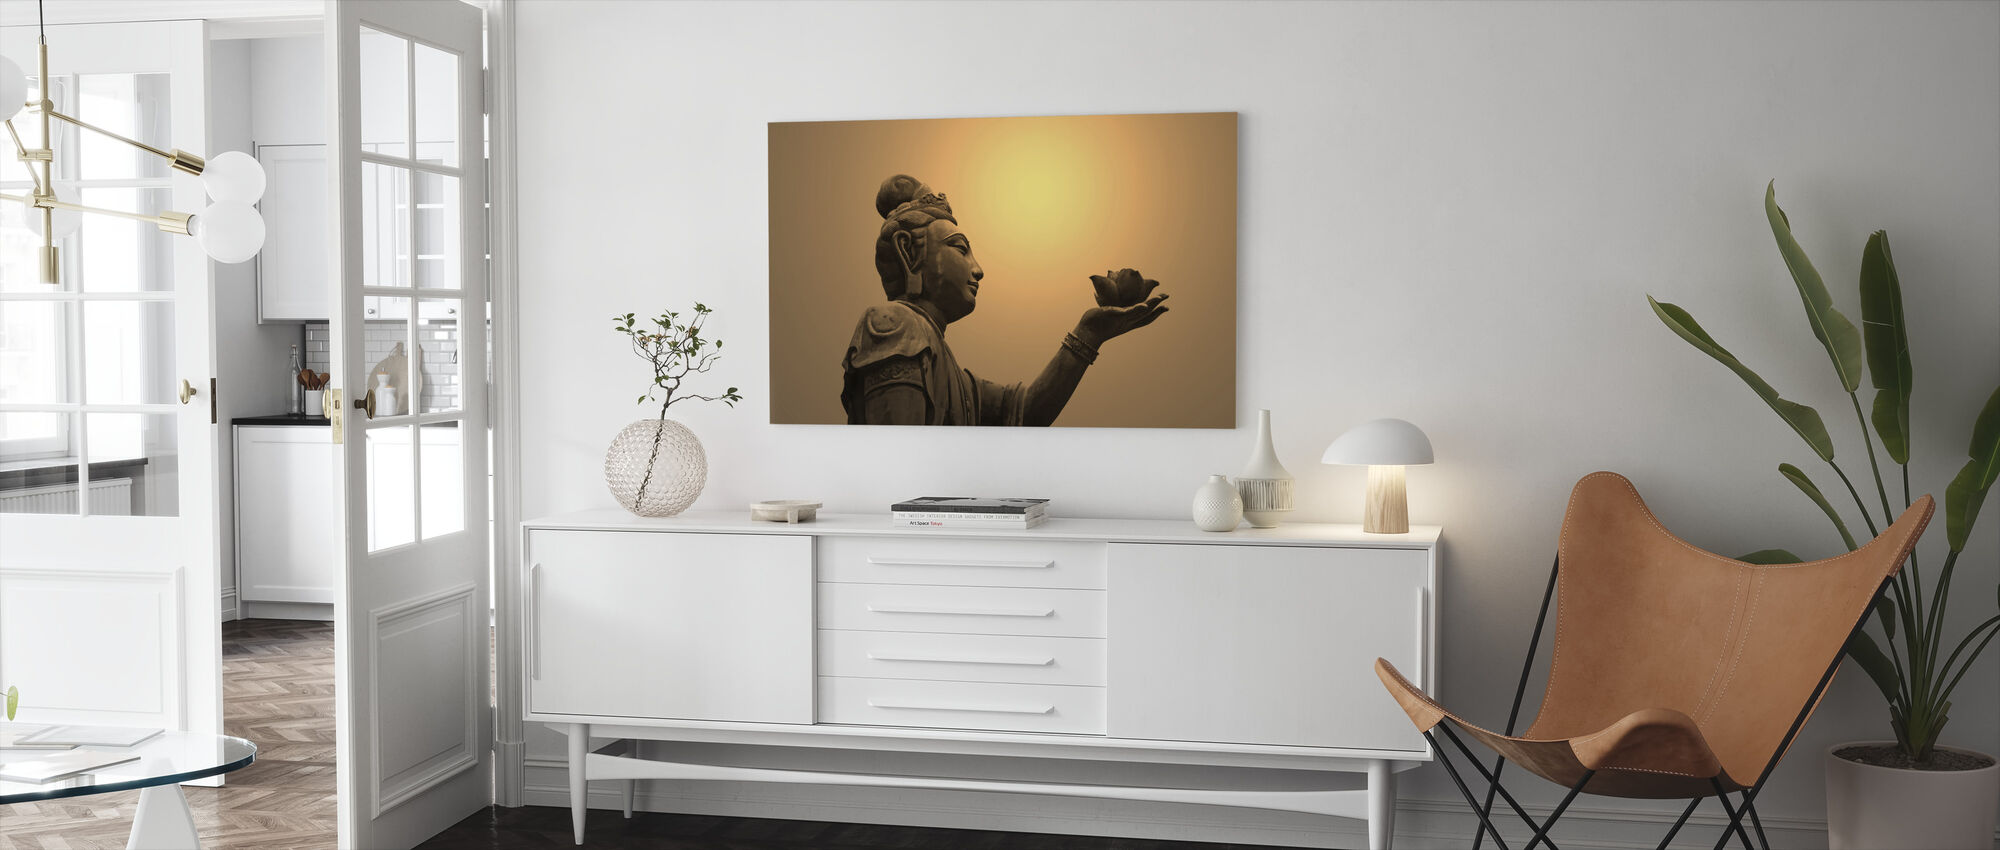 Buddhistische Statue, Hongkong - Leinwandbild - Wohnzimmer